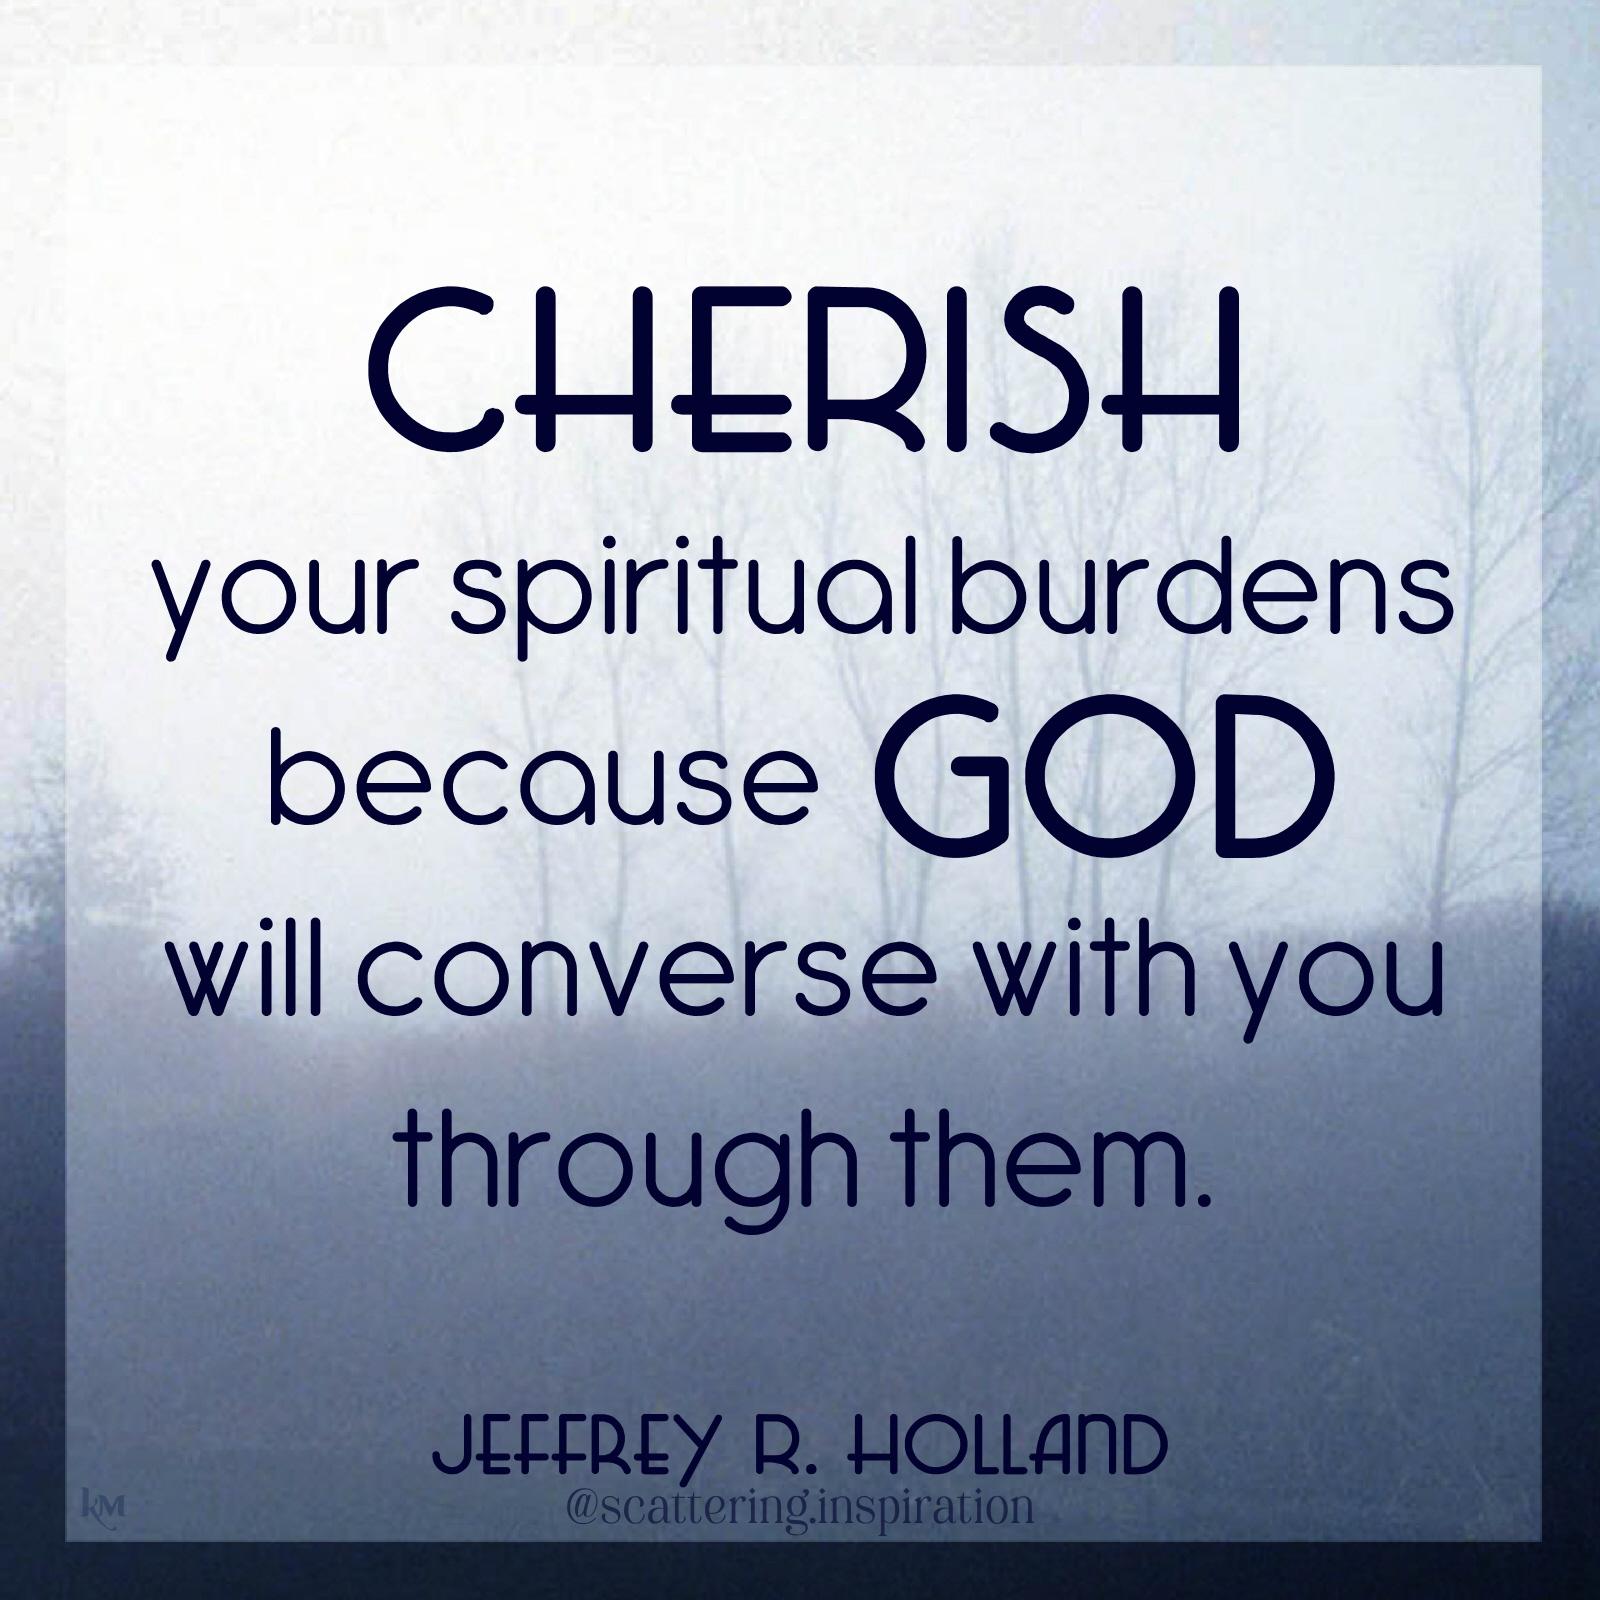 cherish your spiritual burdens